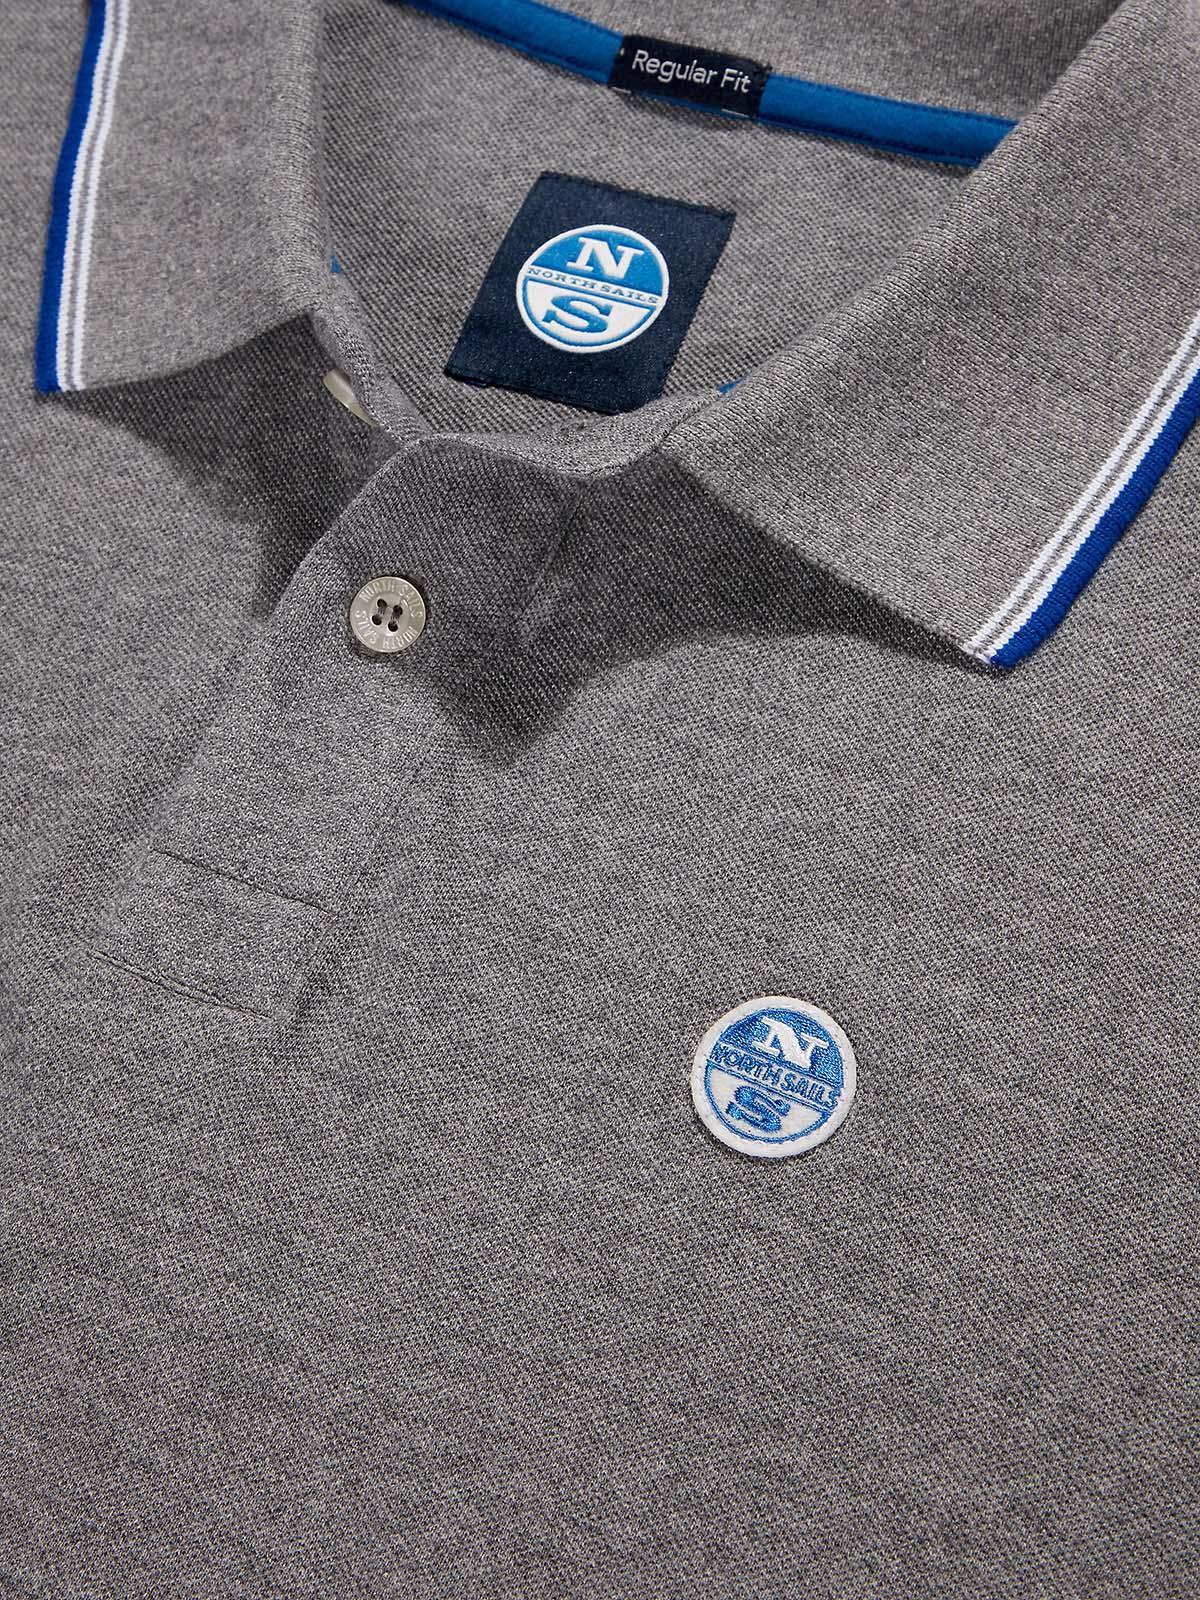 NEW-North-Sails-Legacy-Heritage-Mens-Cotton-Polo-Shirt-Top-Size-S-M-L-XL-XXL-3XL thumbnail 33